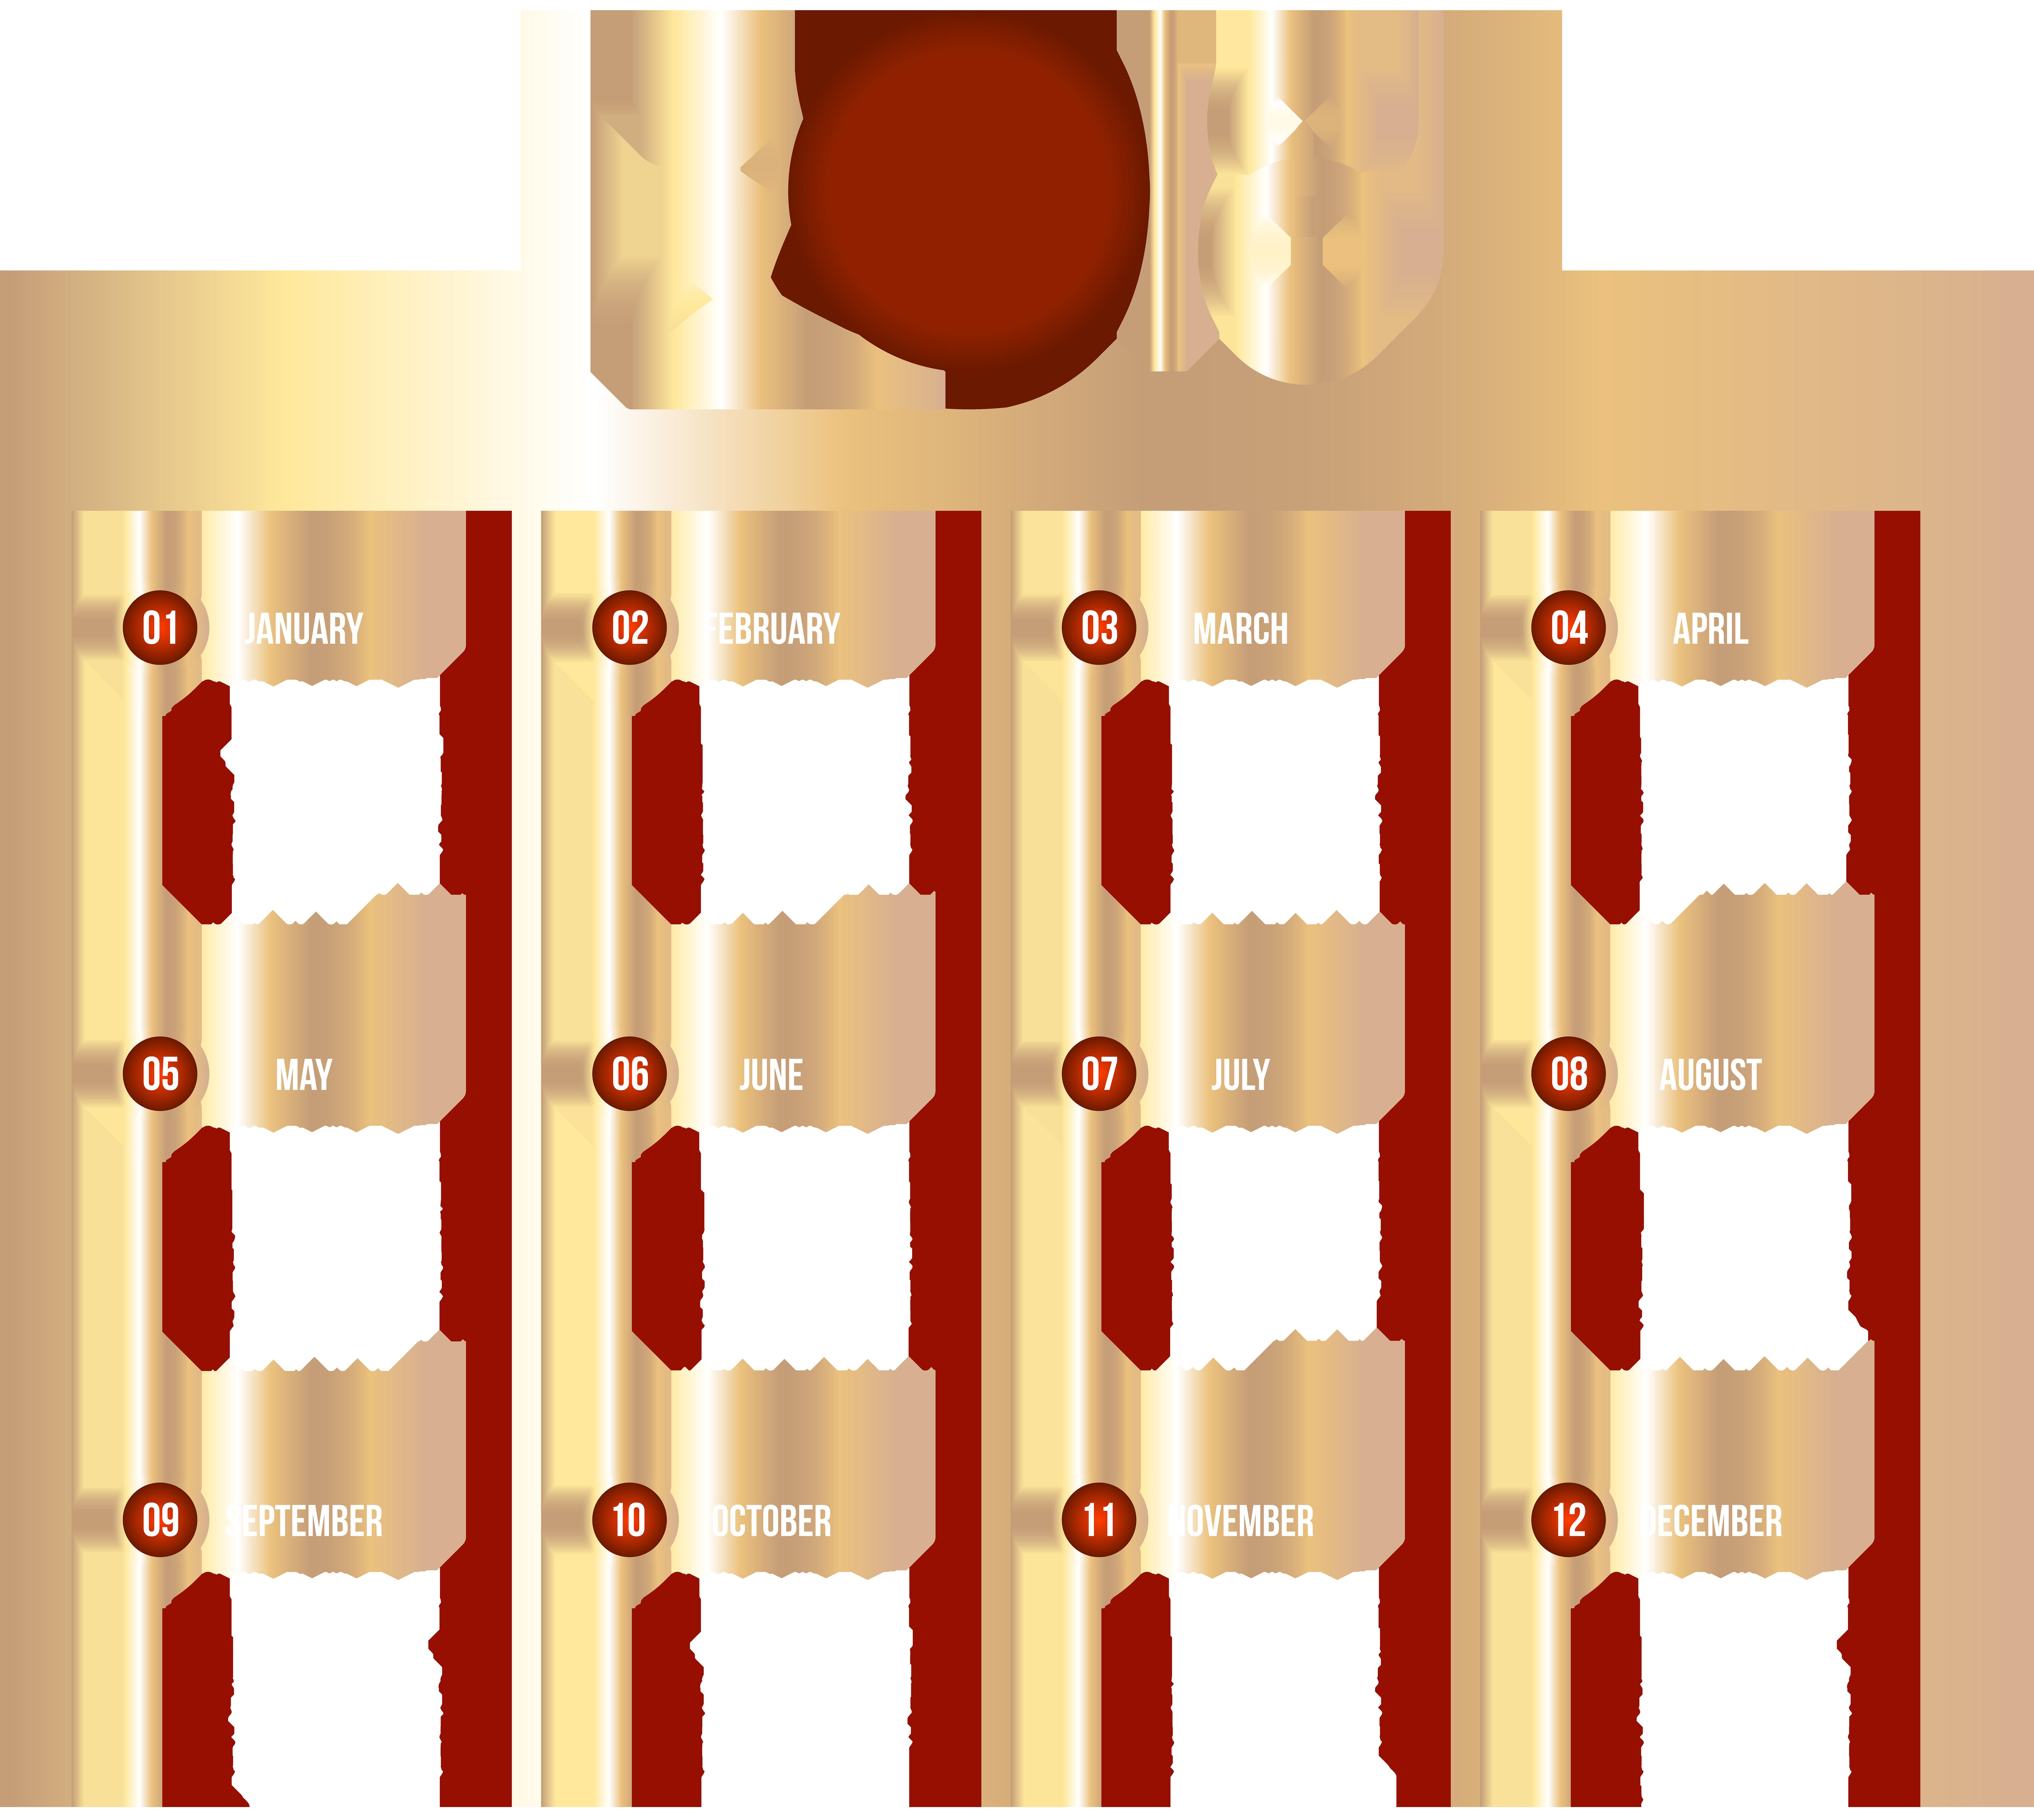 Clipart for august calendar vector royalty free download 2018 Calendar Transparent Clip Art Image | Gallery Yopriceville ... vector royalty free download